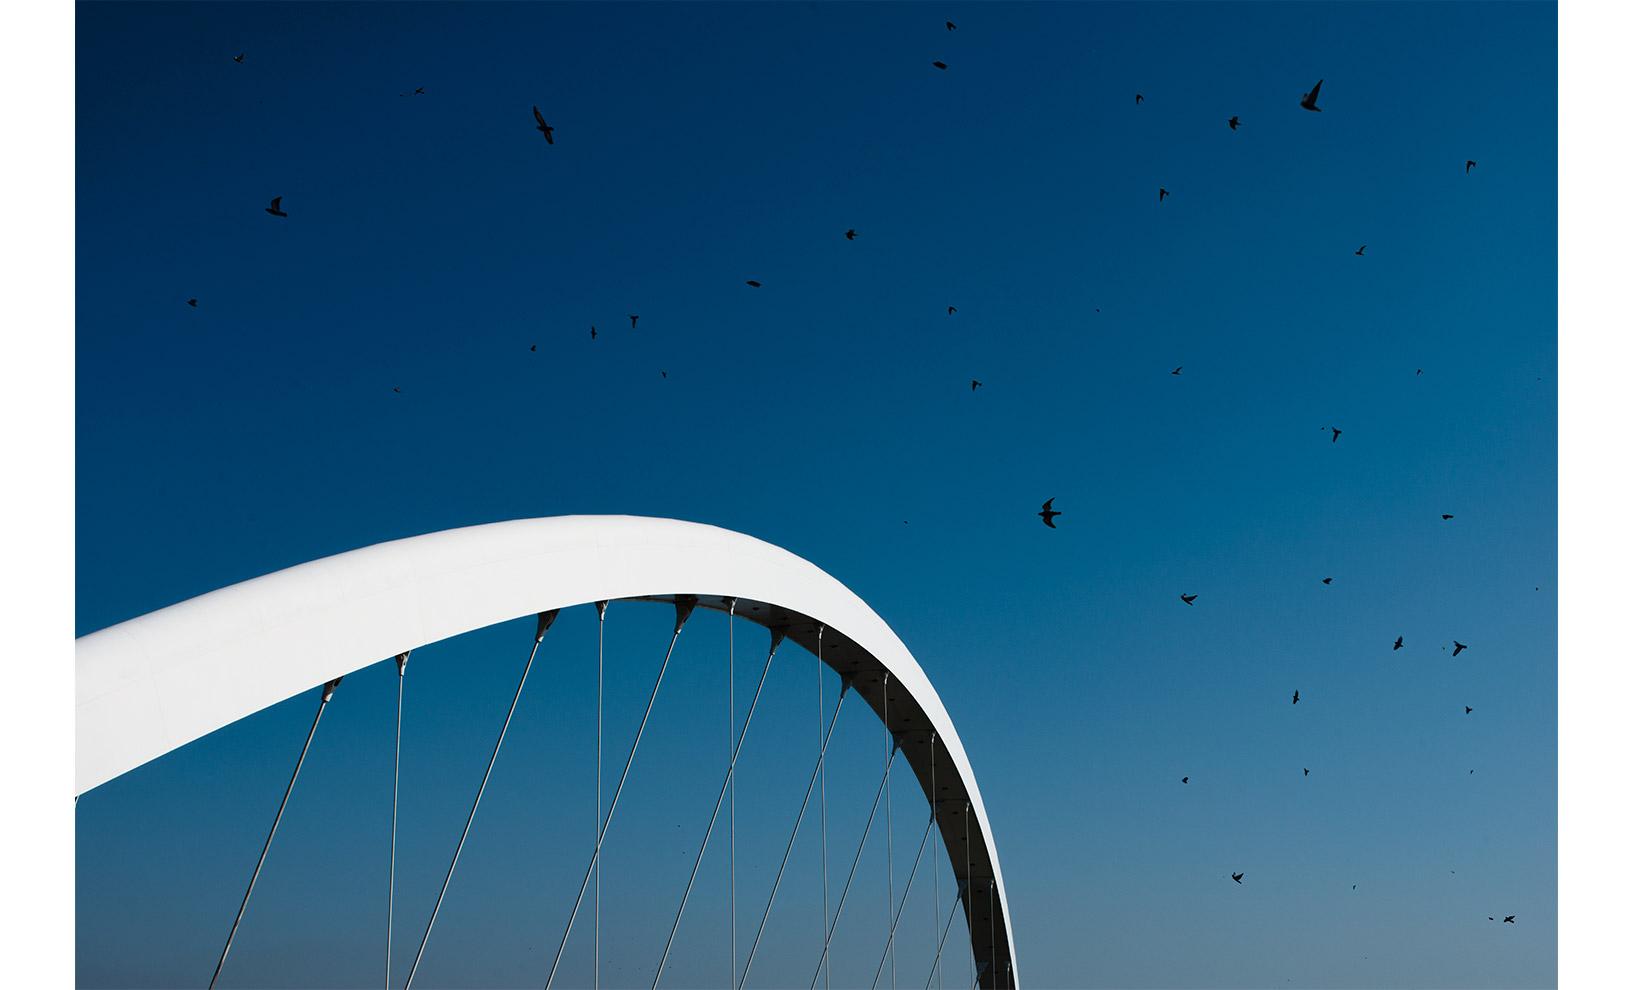 ©marco-tacchini-fotografo-ponte-cittadella-richar-meier-and-partners_02